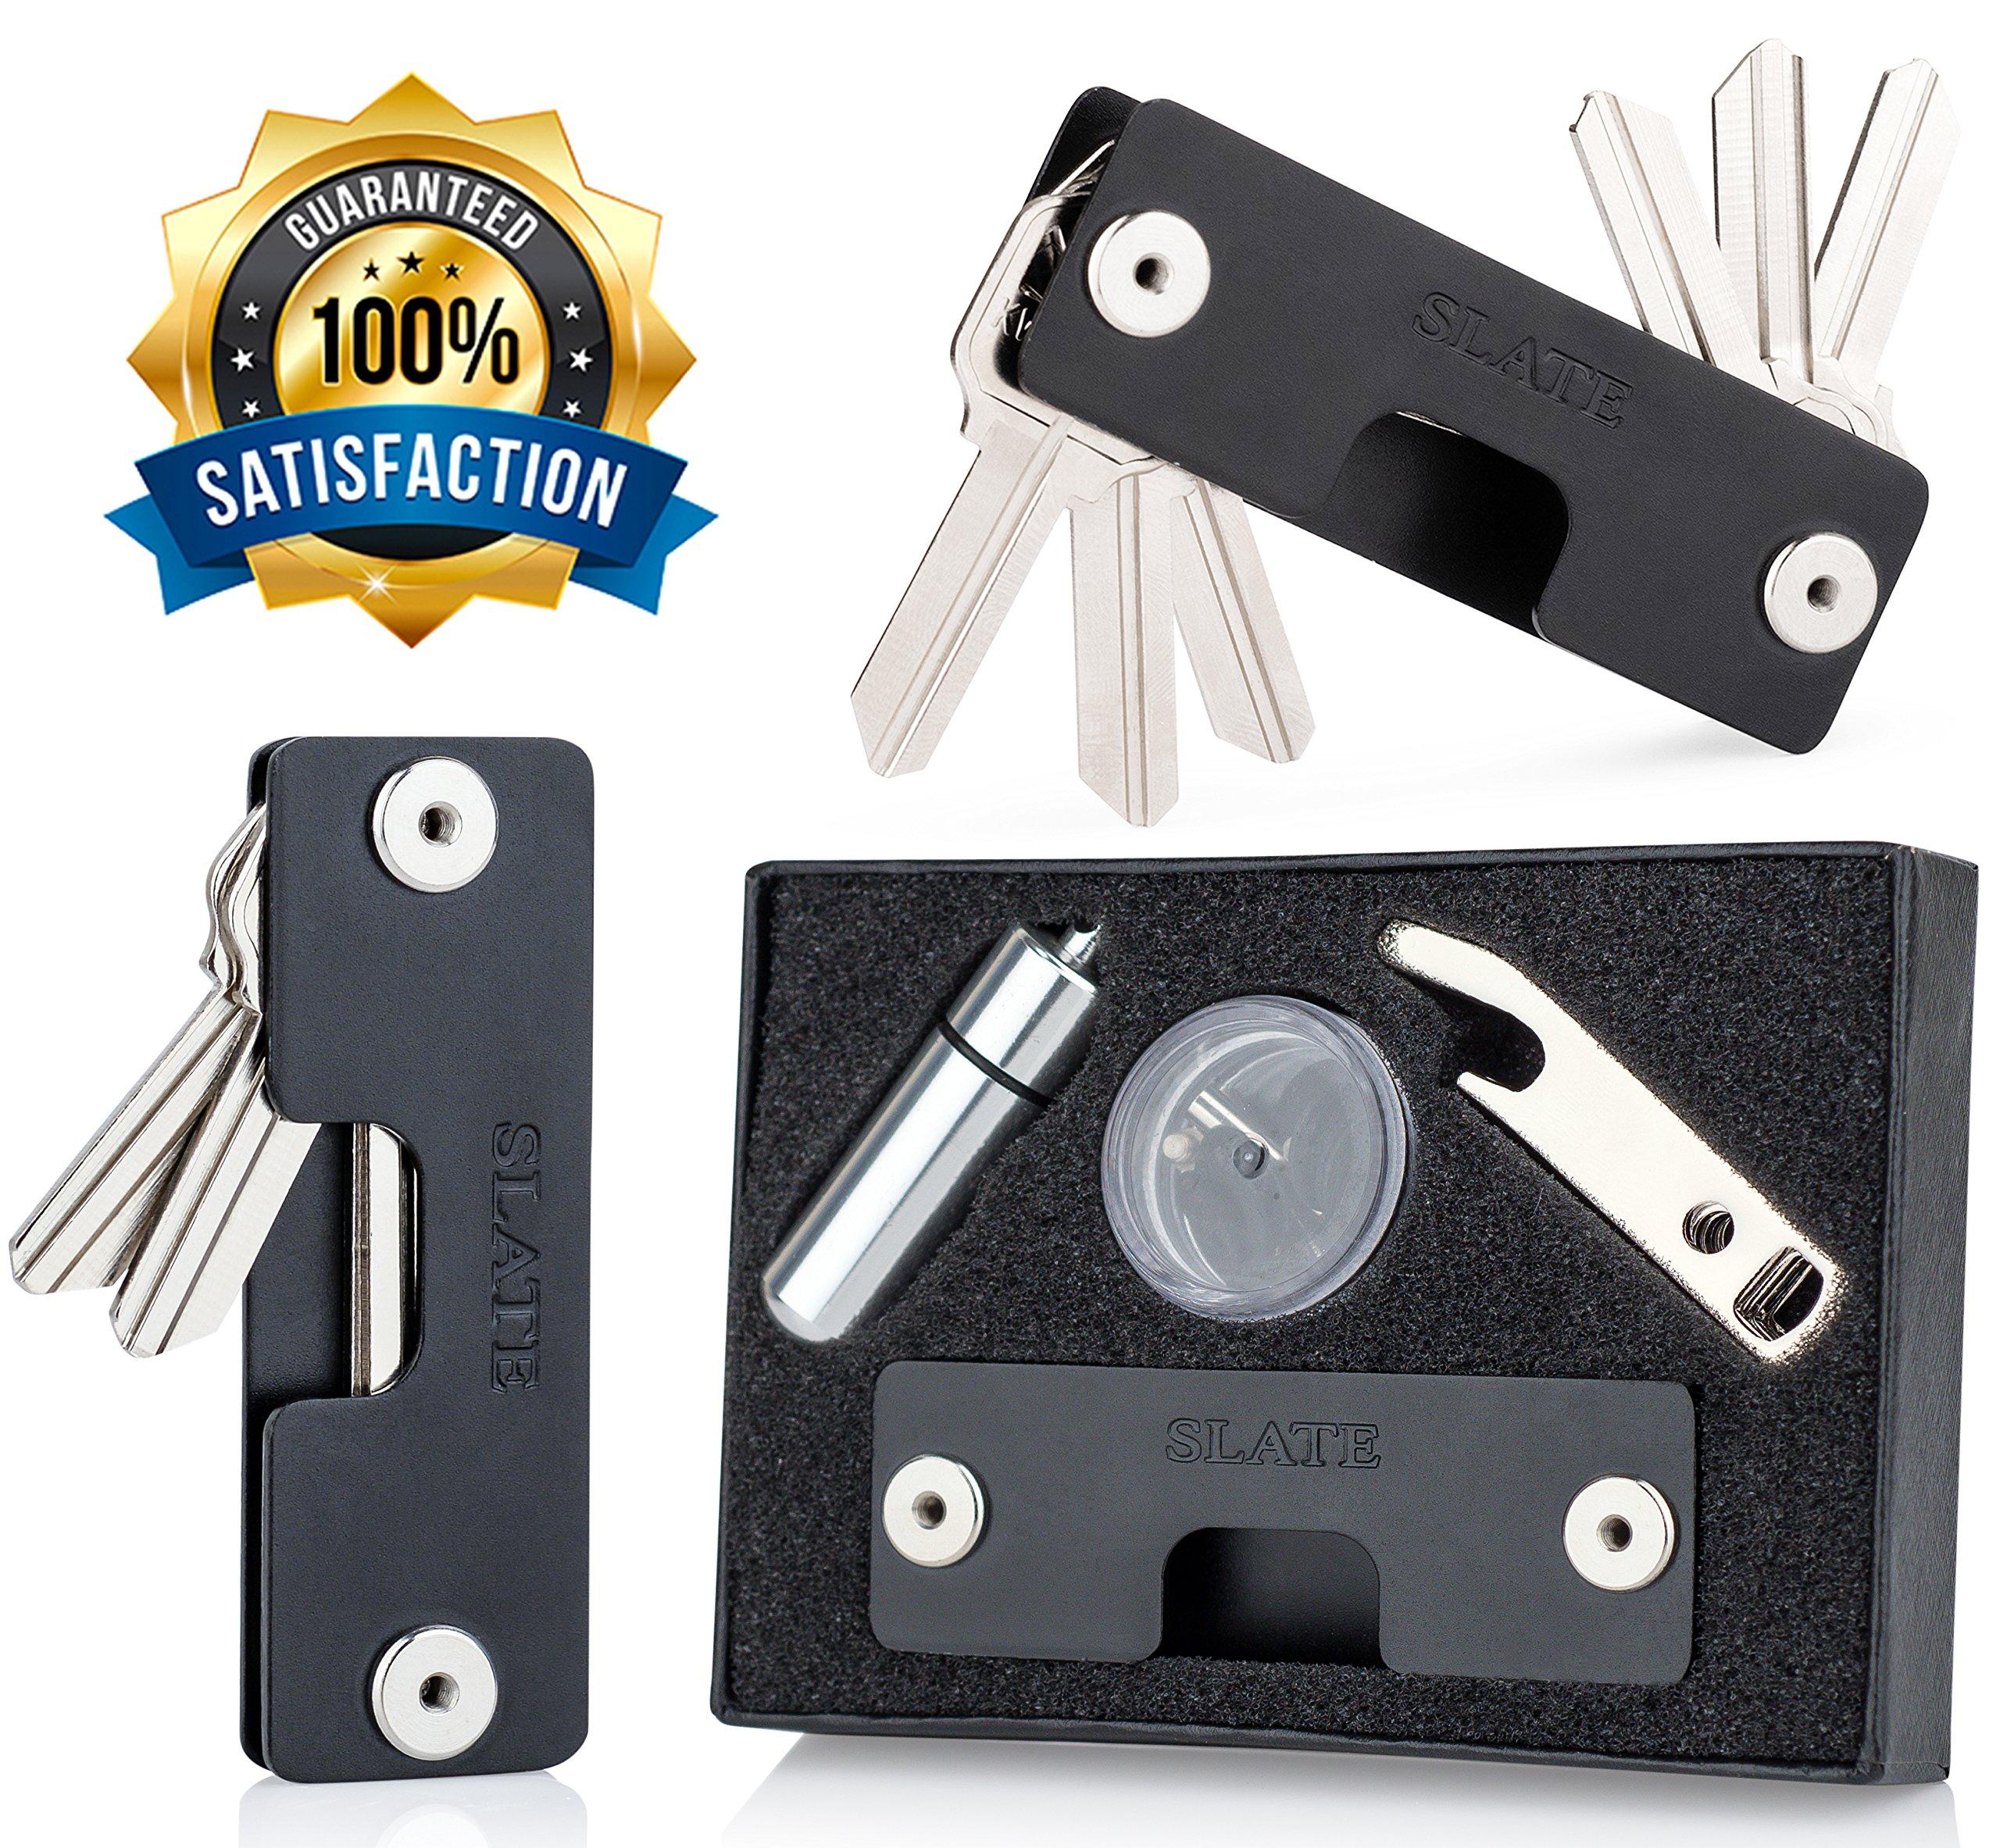 SLATE Key Holder Keychain Organizer Pocket Portable Aluminum Compact Smart Key Tool - Best Gift (Black)